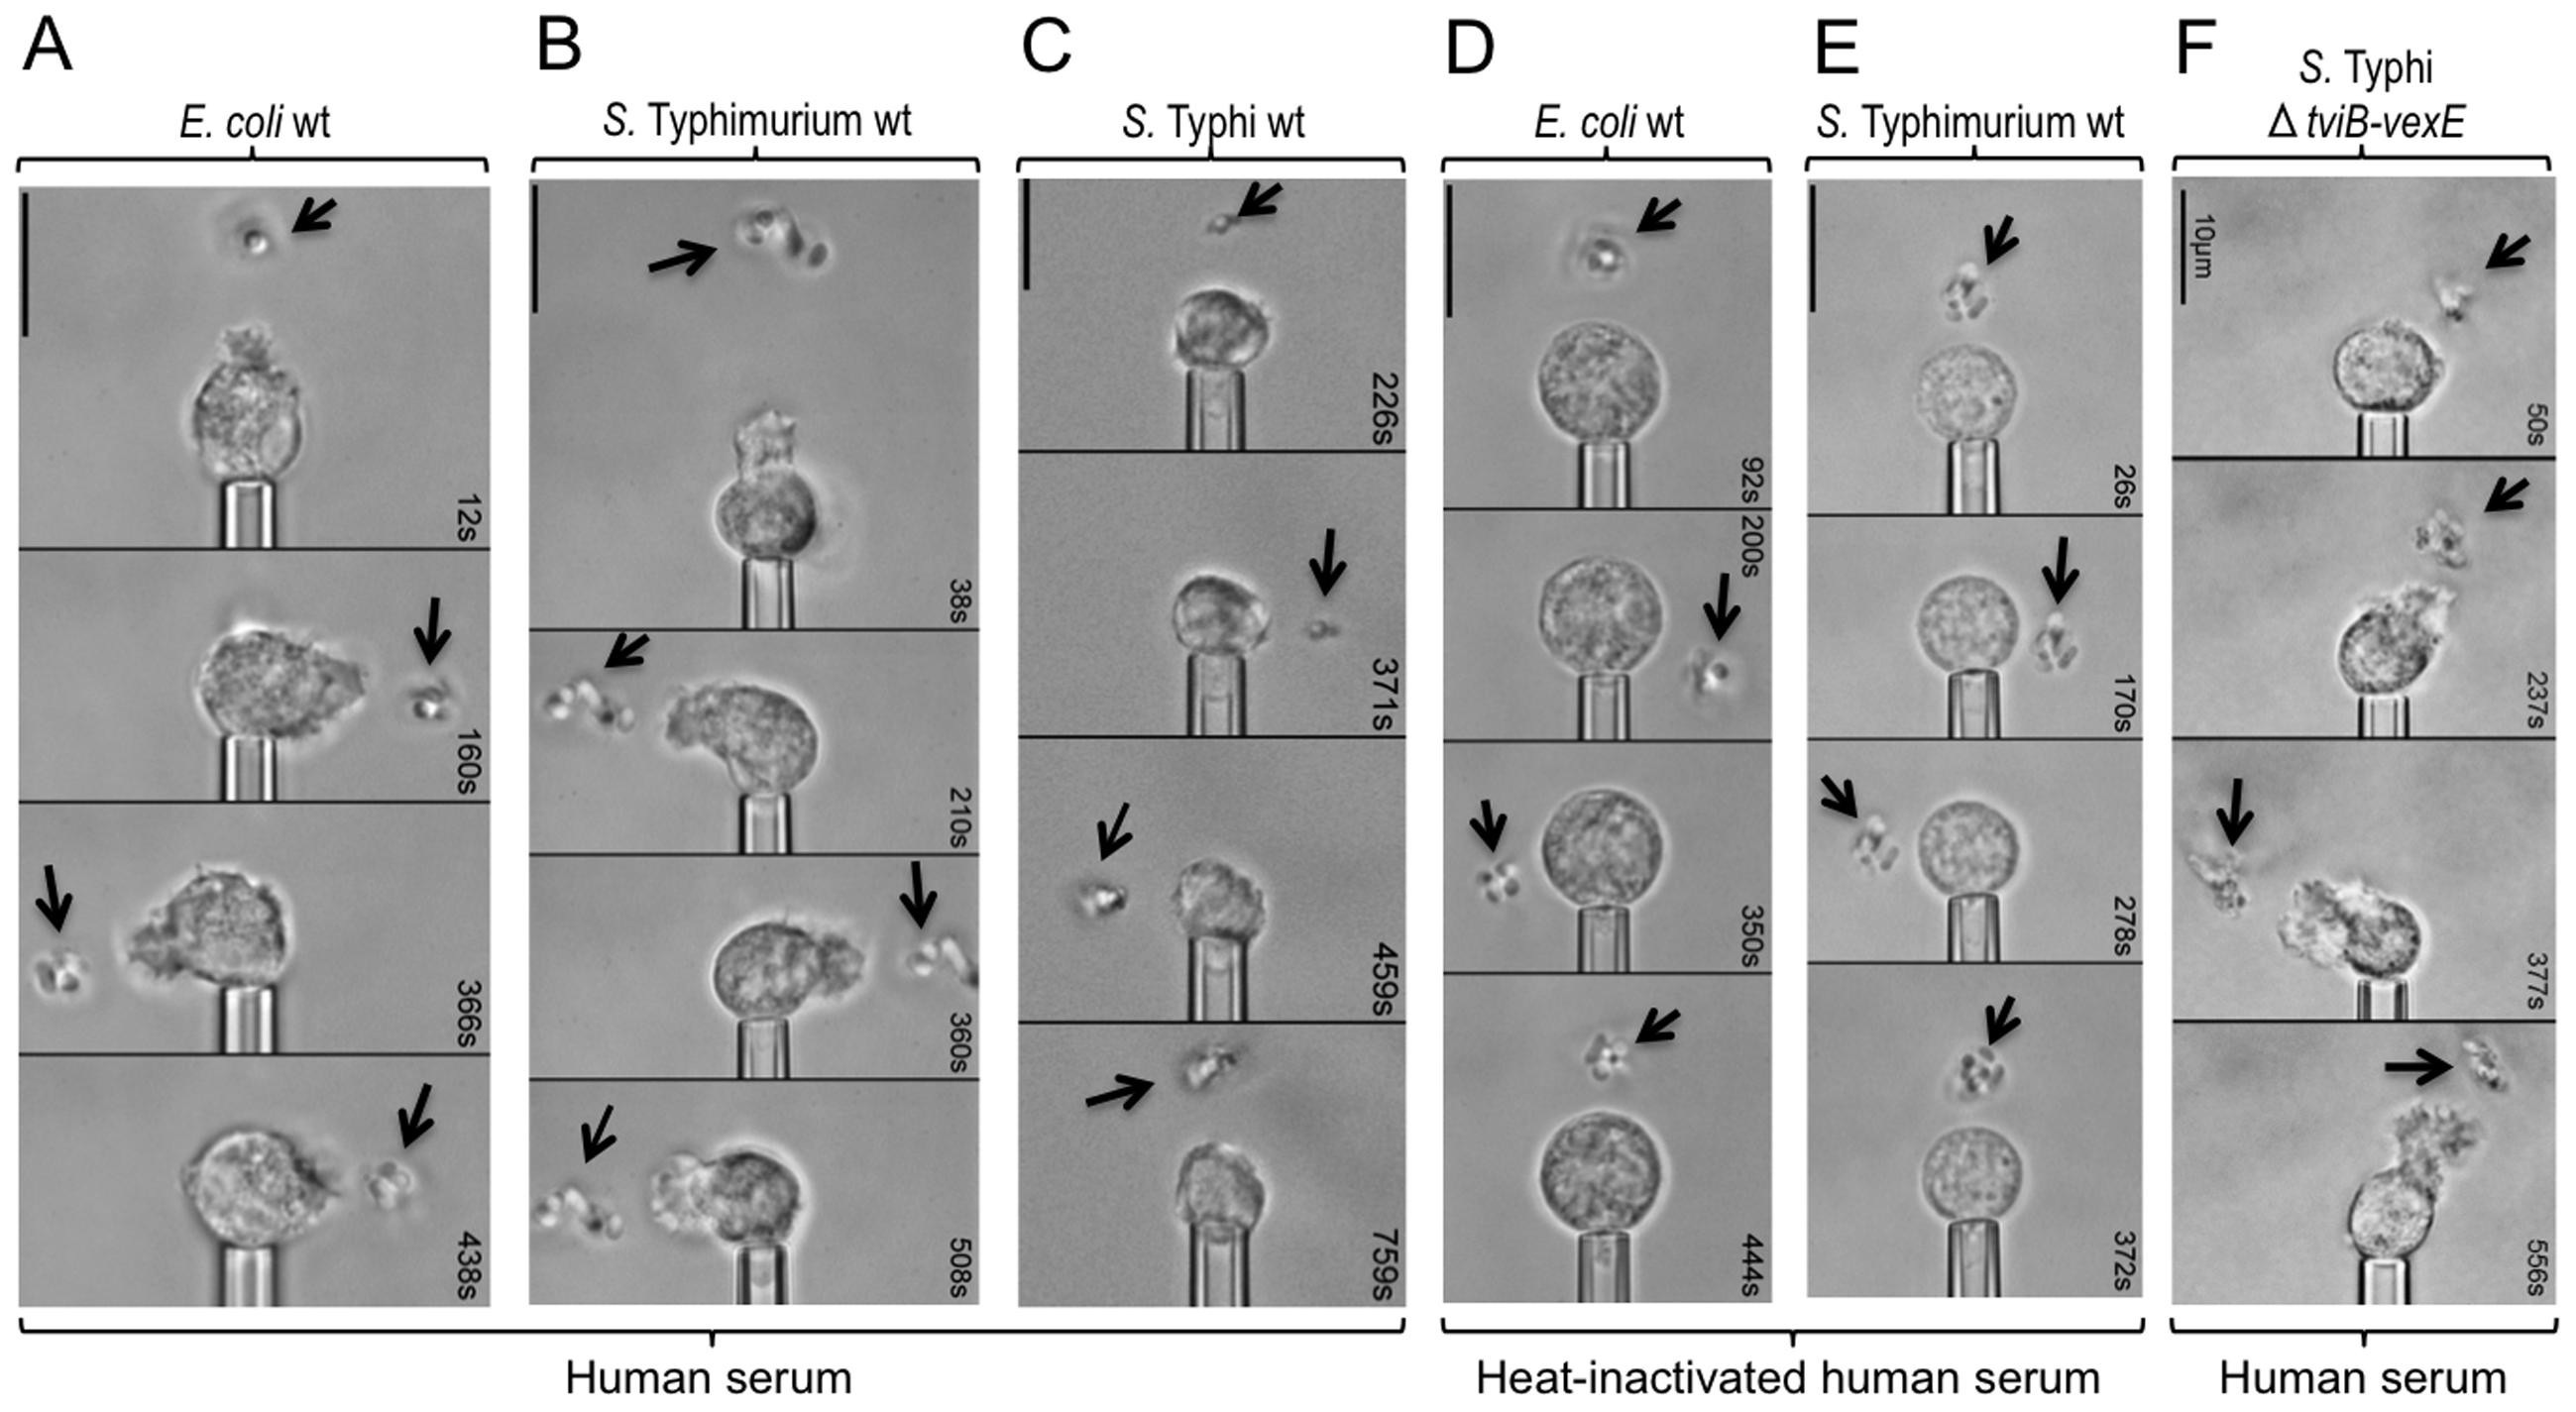 The Vi capsular polysaccharide inhibits chemotactic responses of human neutrophils <i>in vitro</i>.